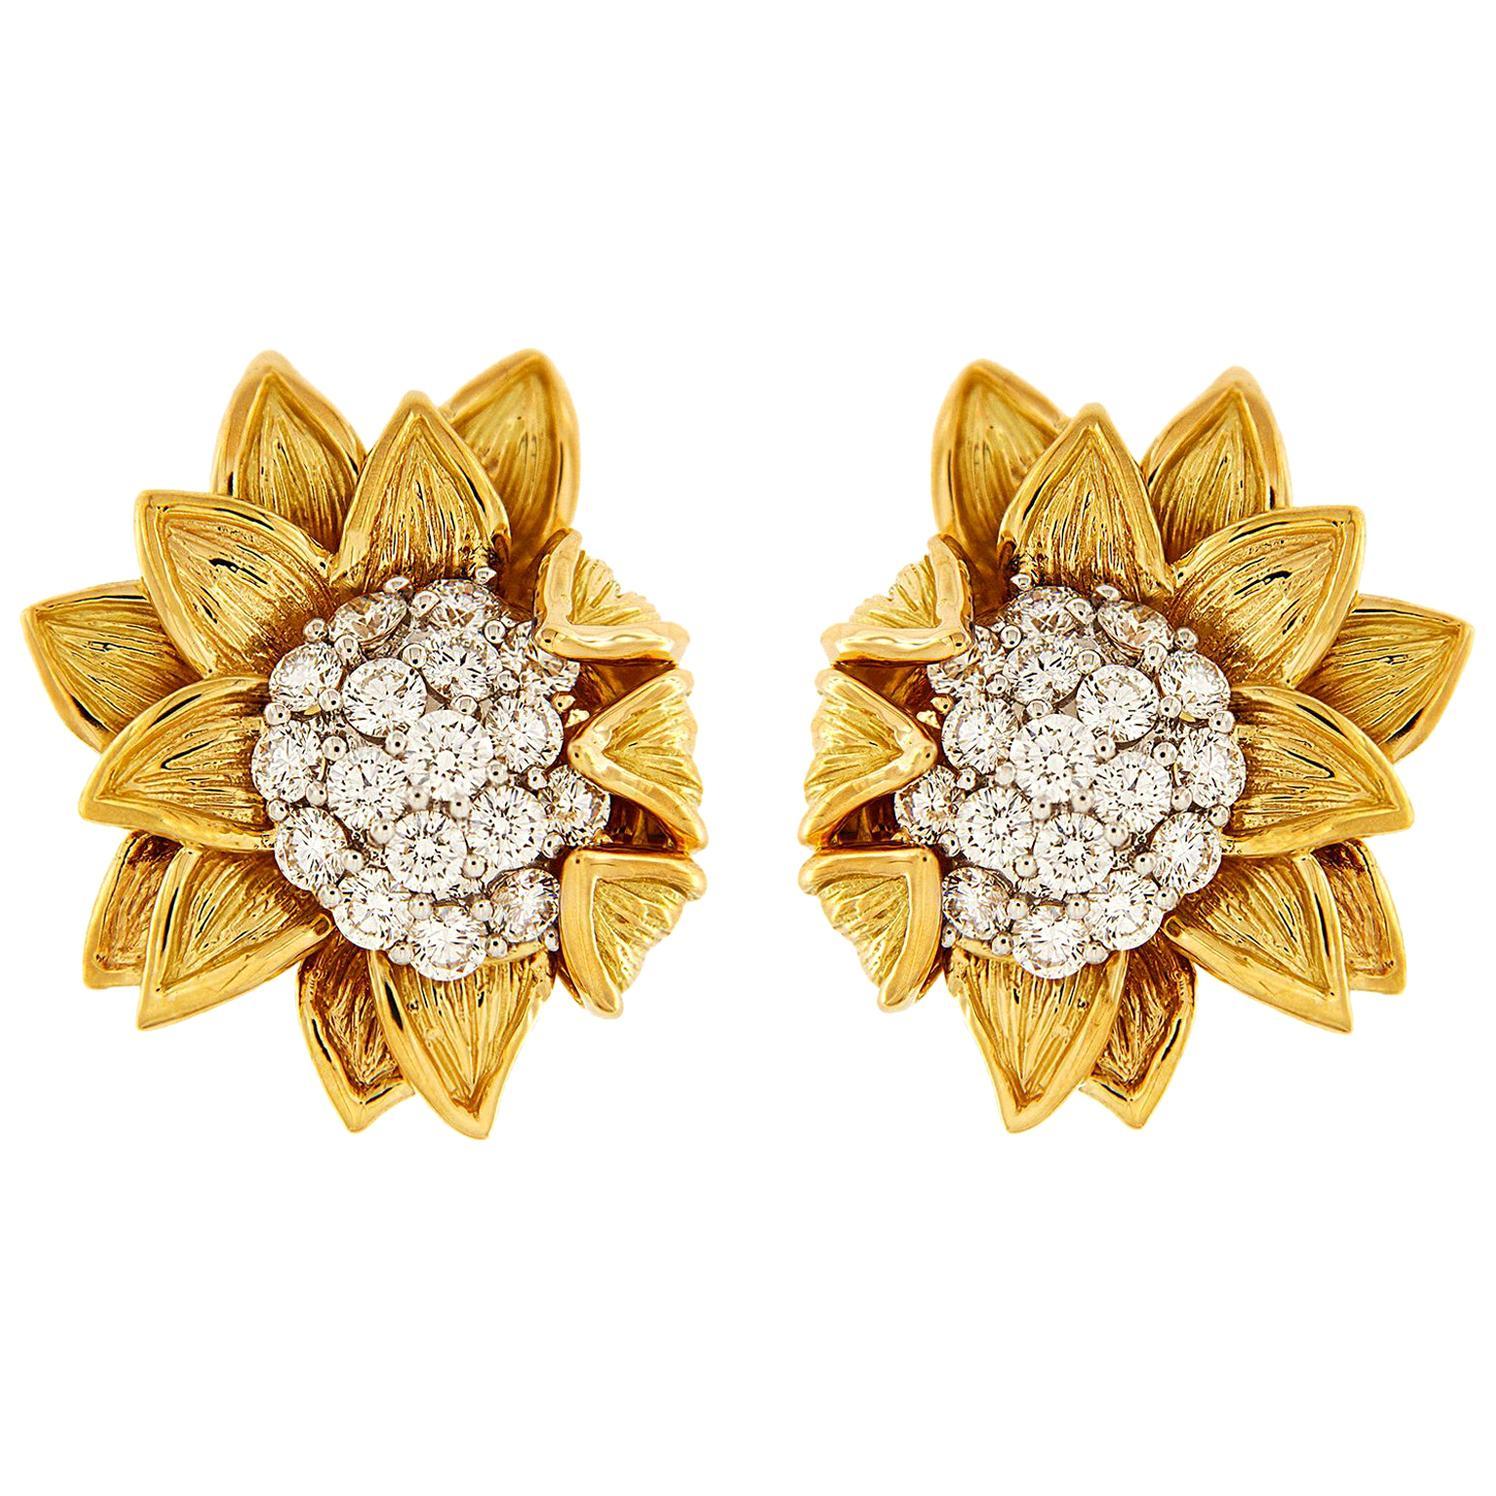 Valentin Magro Yellow Gold Diamond Sunflower Fold over Earrings